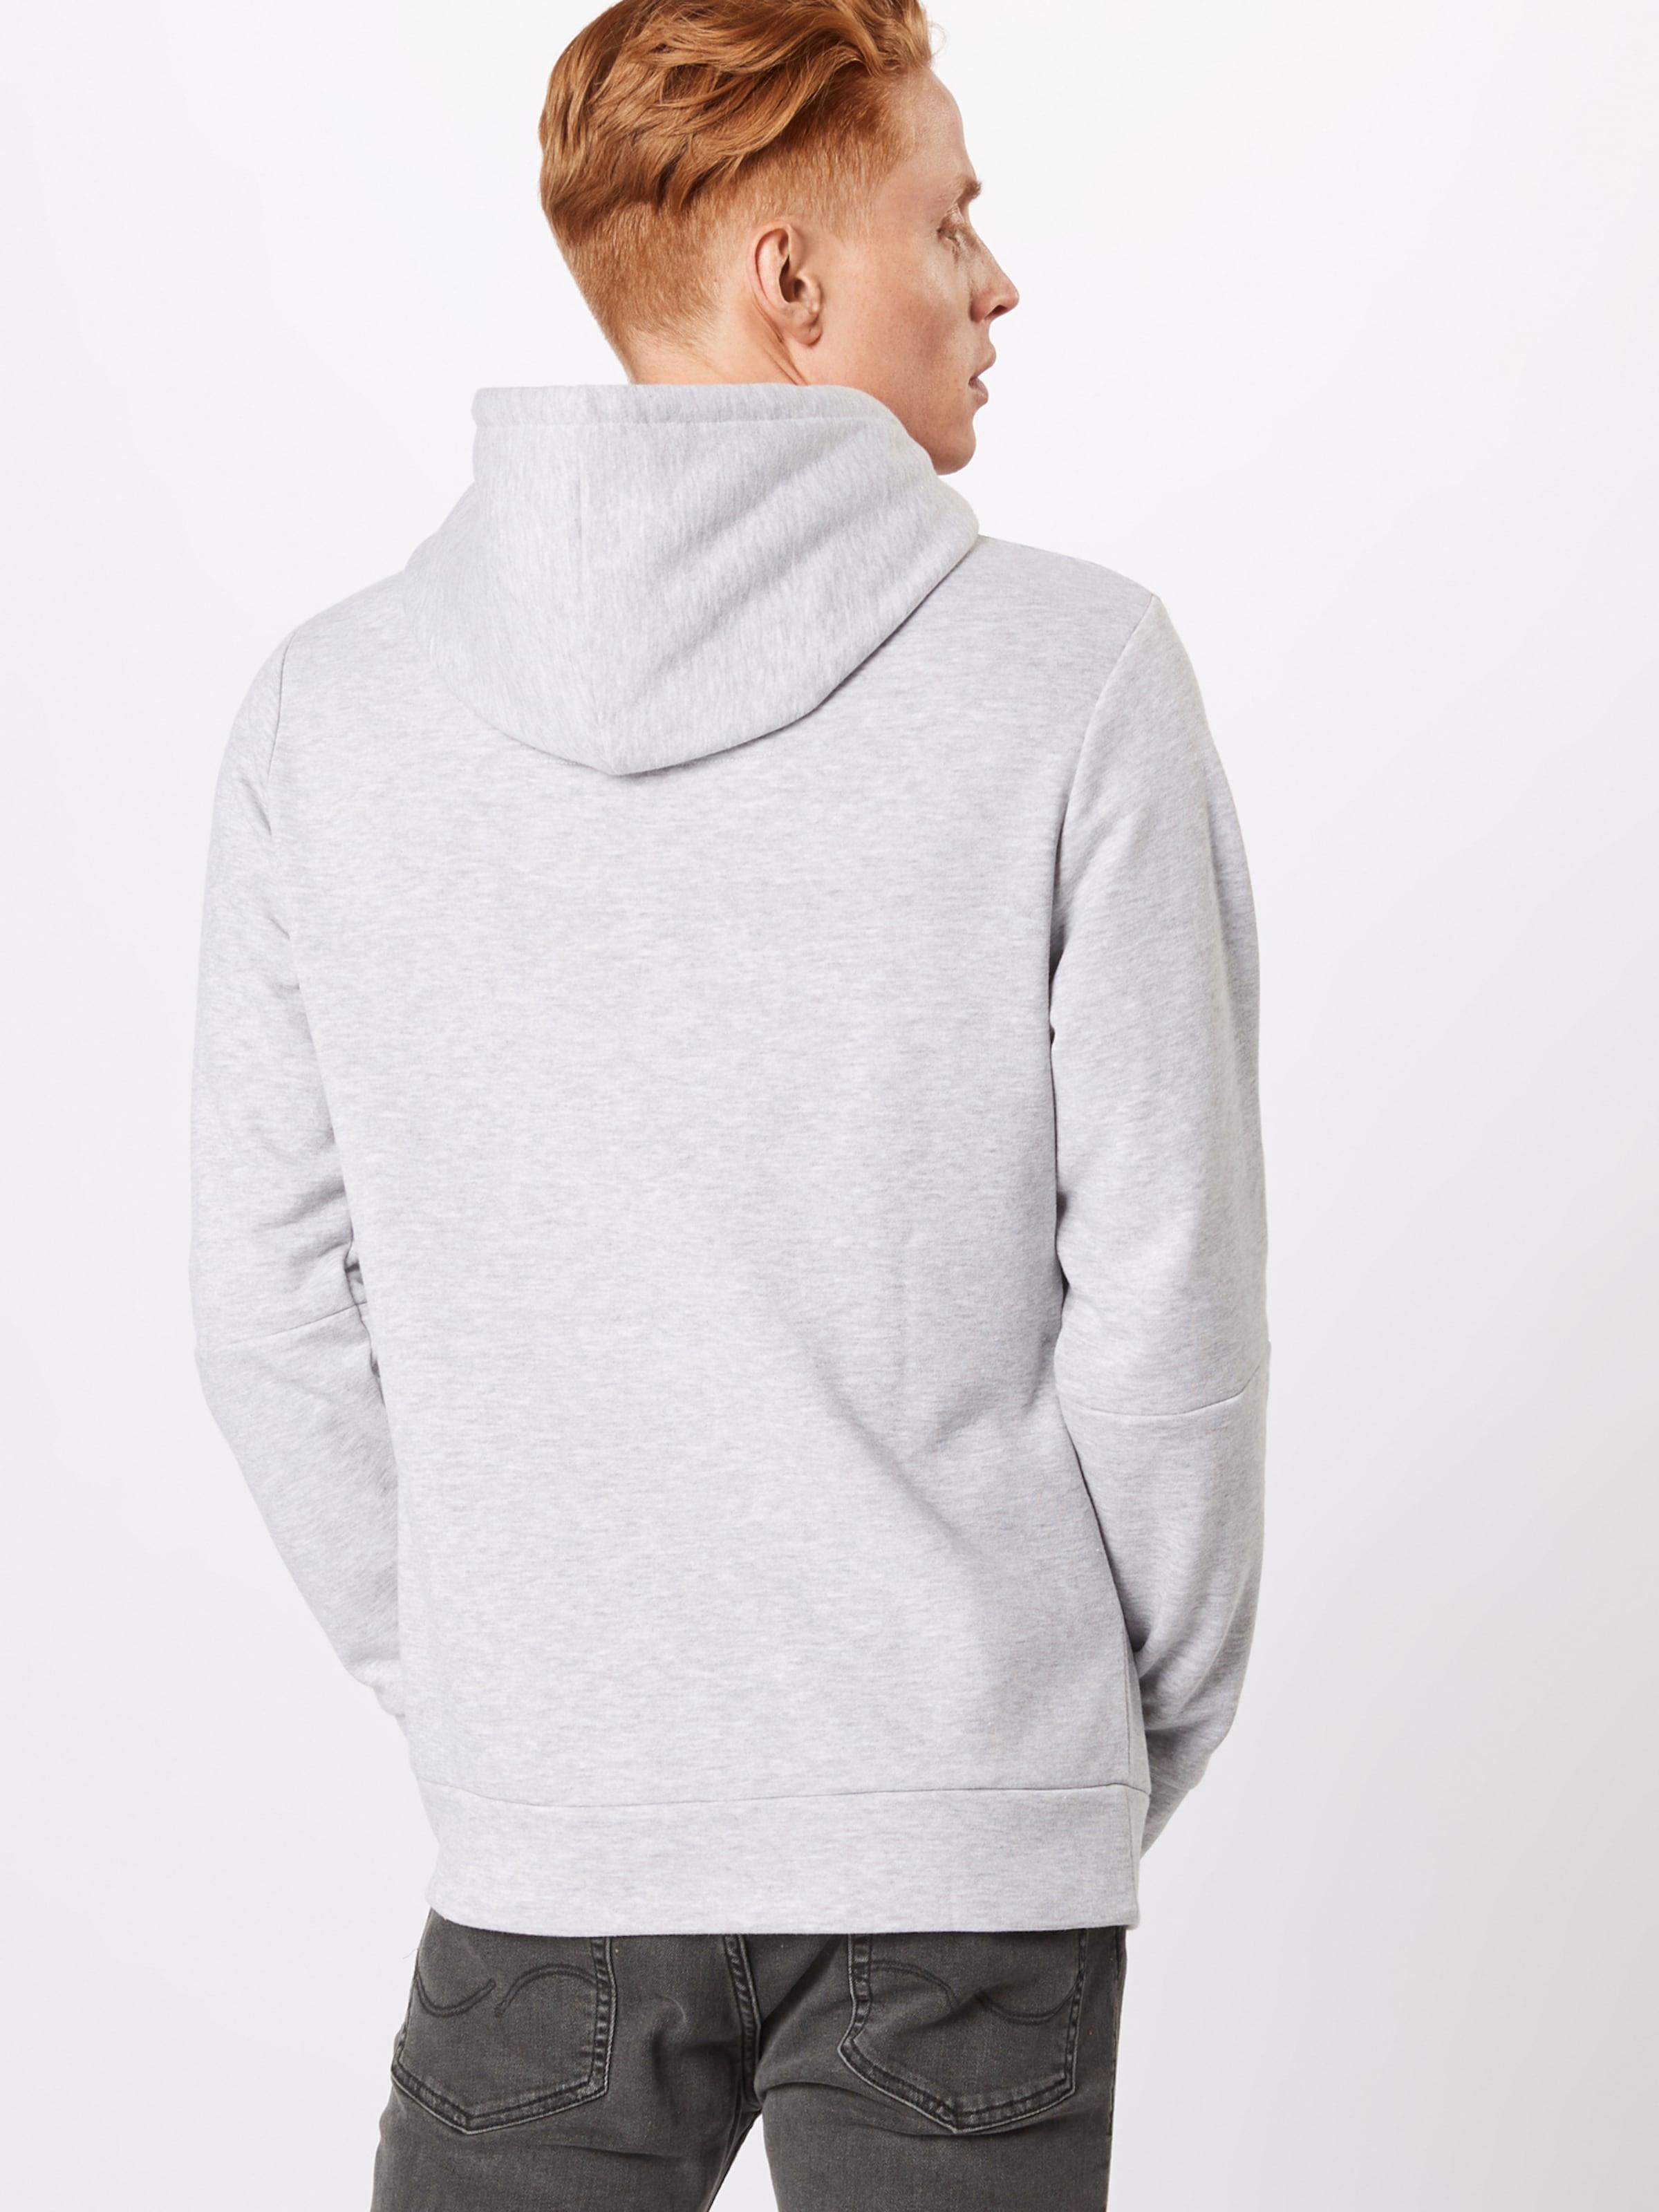 Hood' shirt Jackamp; FoncéJaune 'casal Jones Sweat Sweat En Bleu 6Ybf7gyv